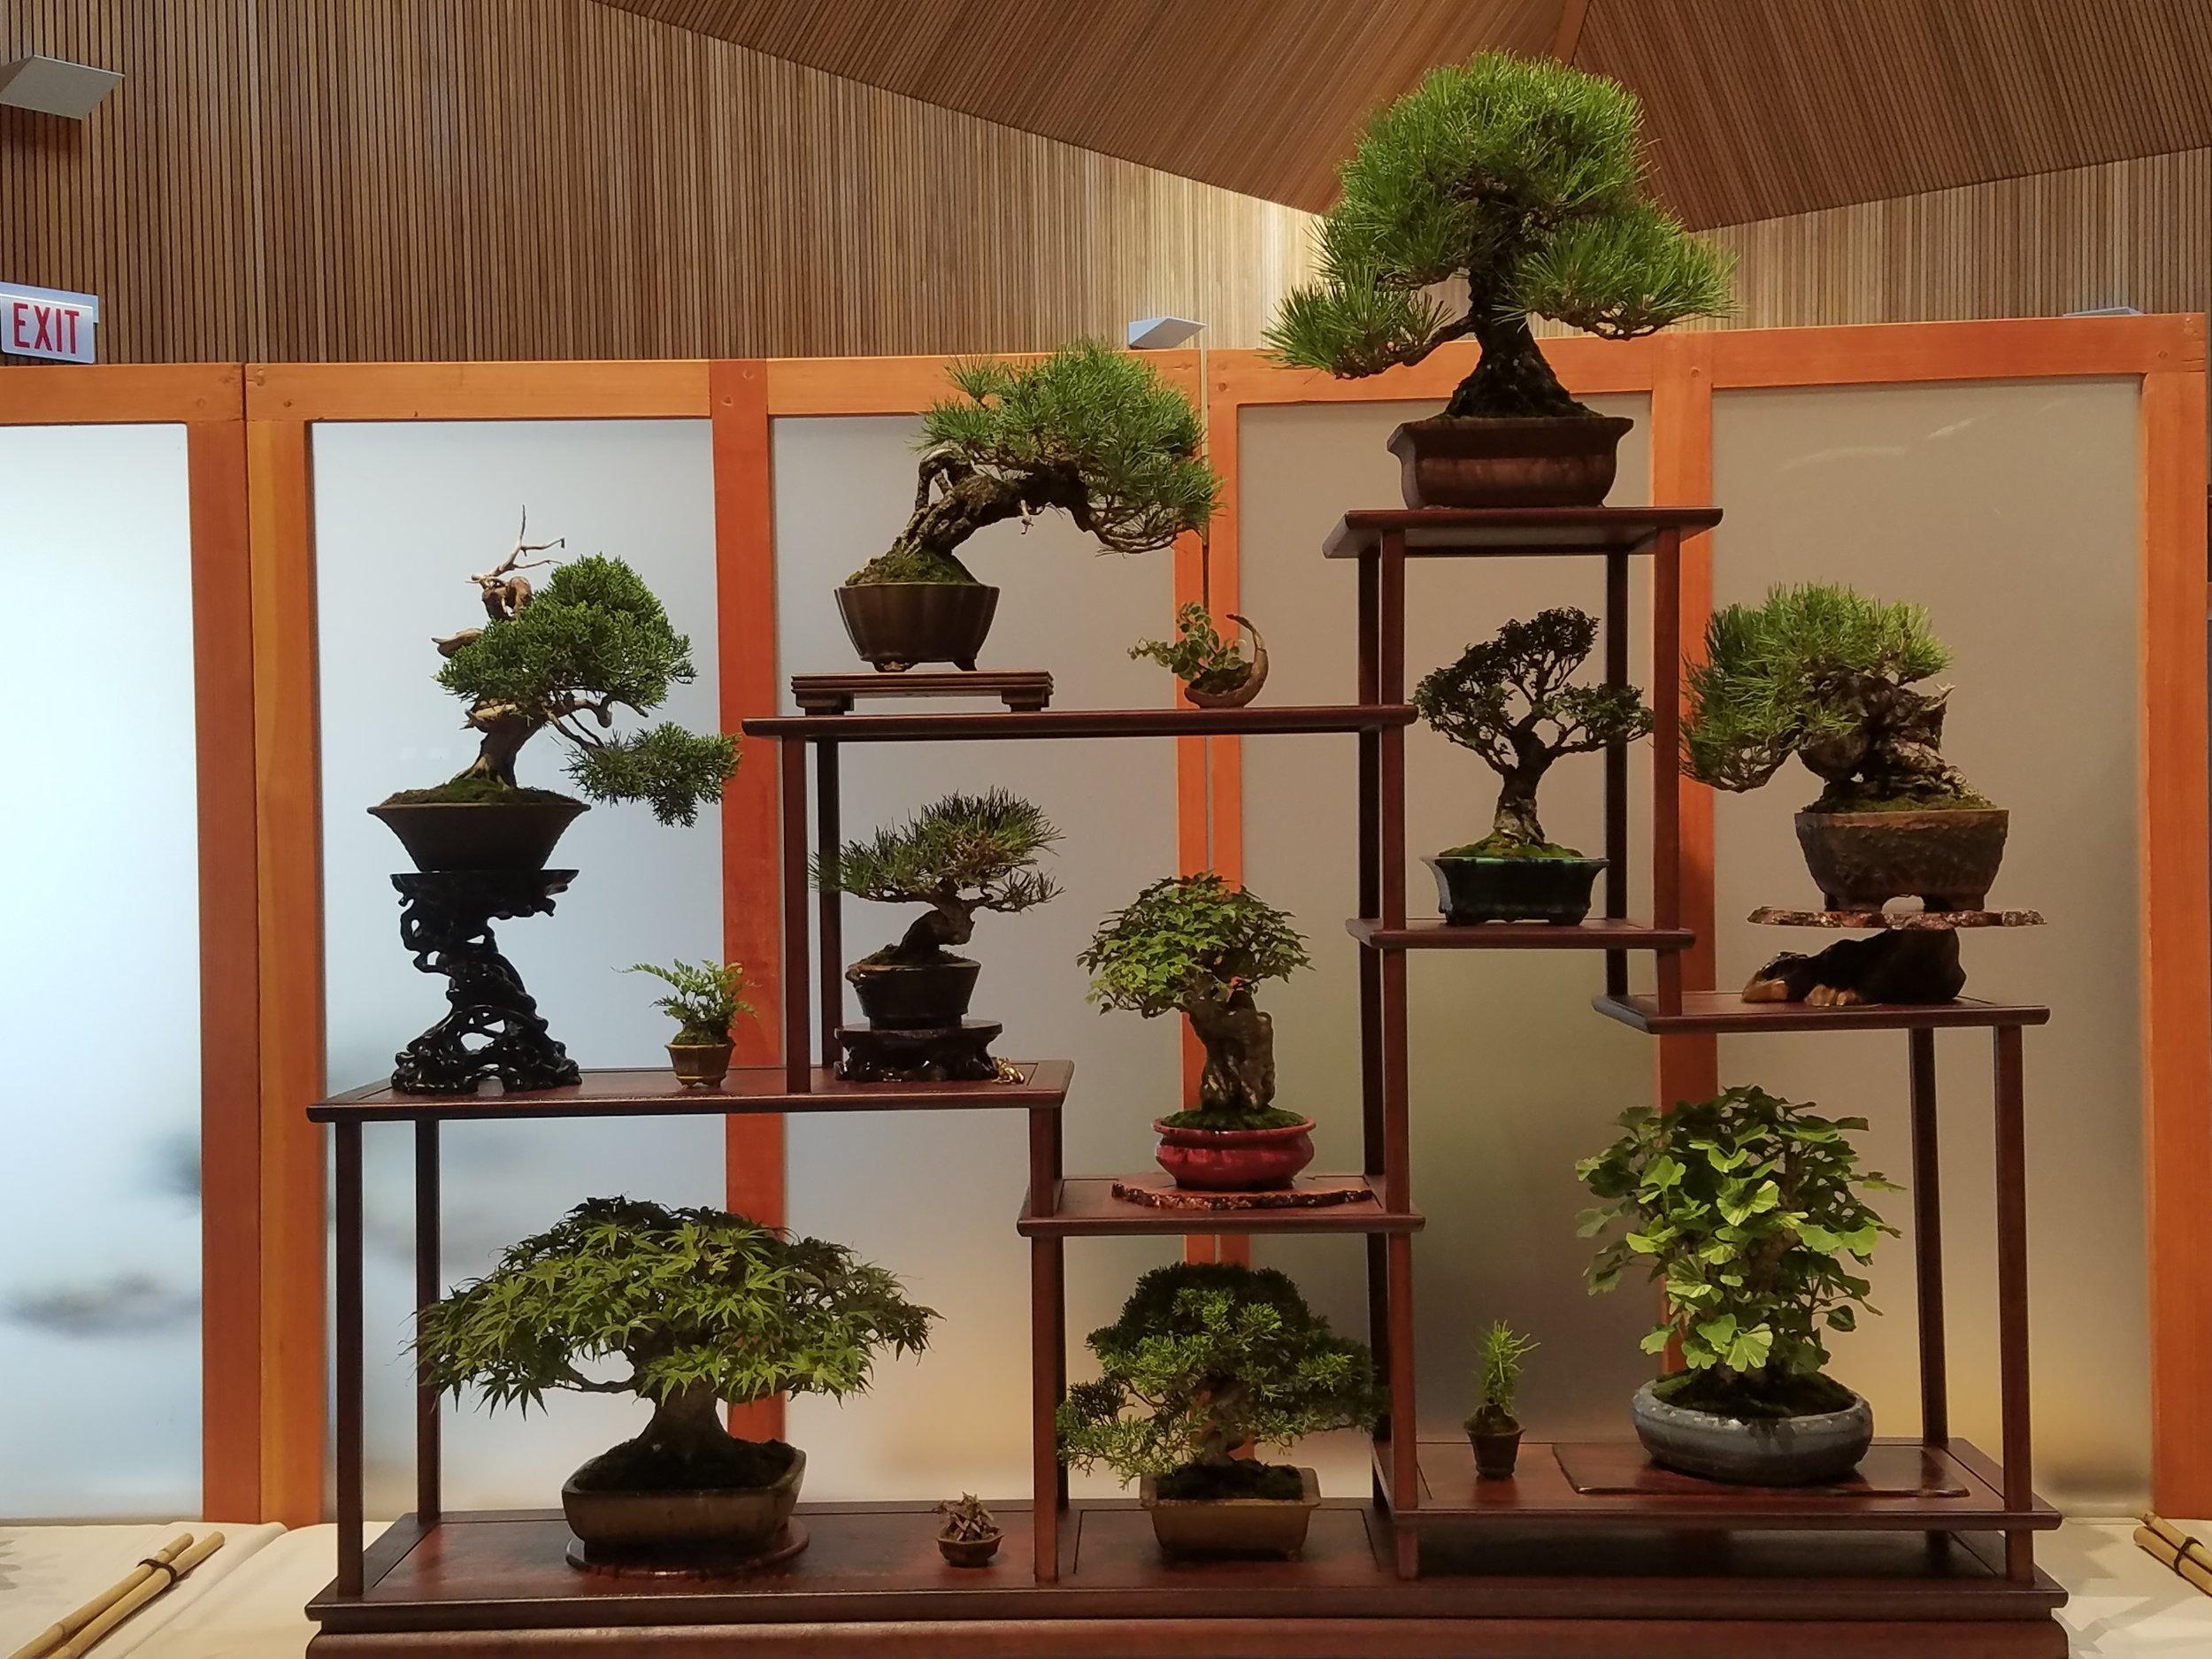 2017 Mid-America Bonsai Exhibition - Shohin 10 Tree Display